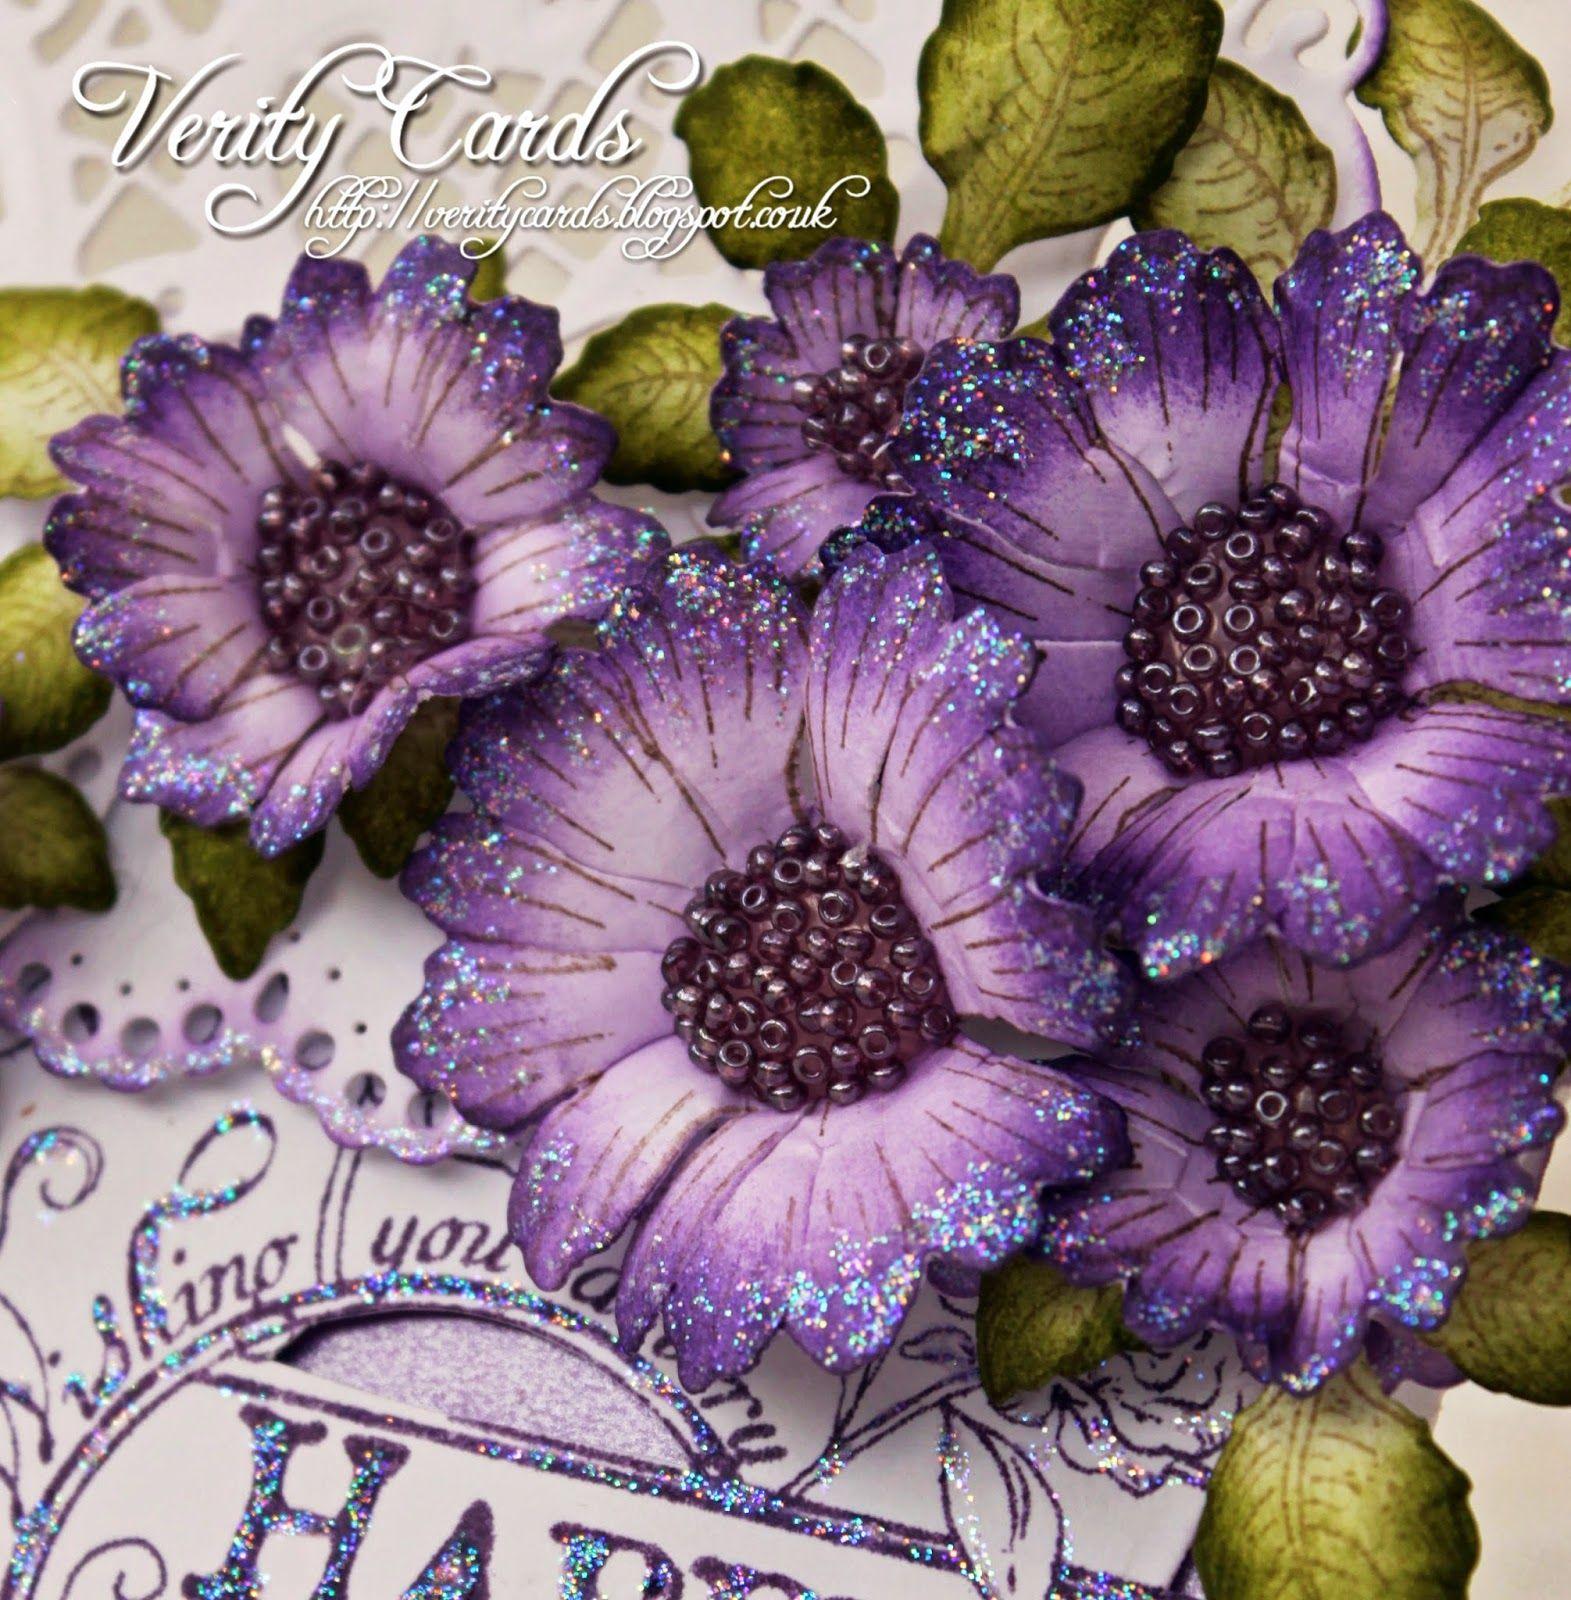 Verity cards flower making tutorial paper craft projects verity cards flower making tutorial mightylinksfo